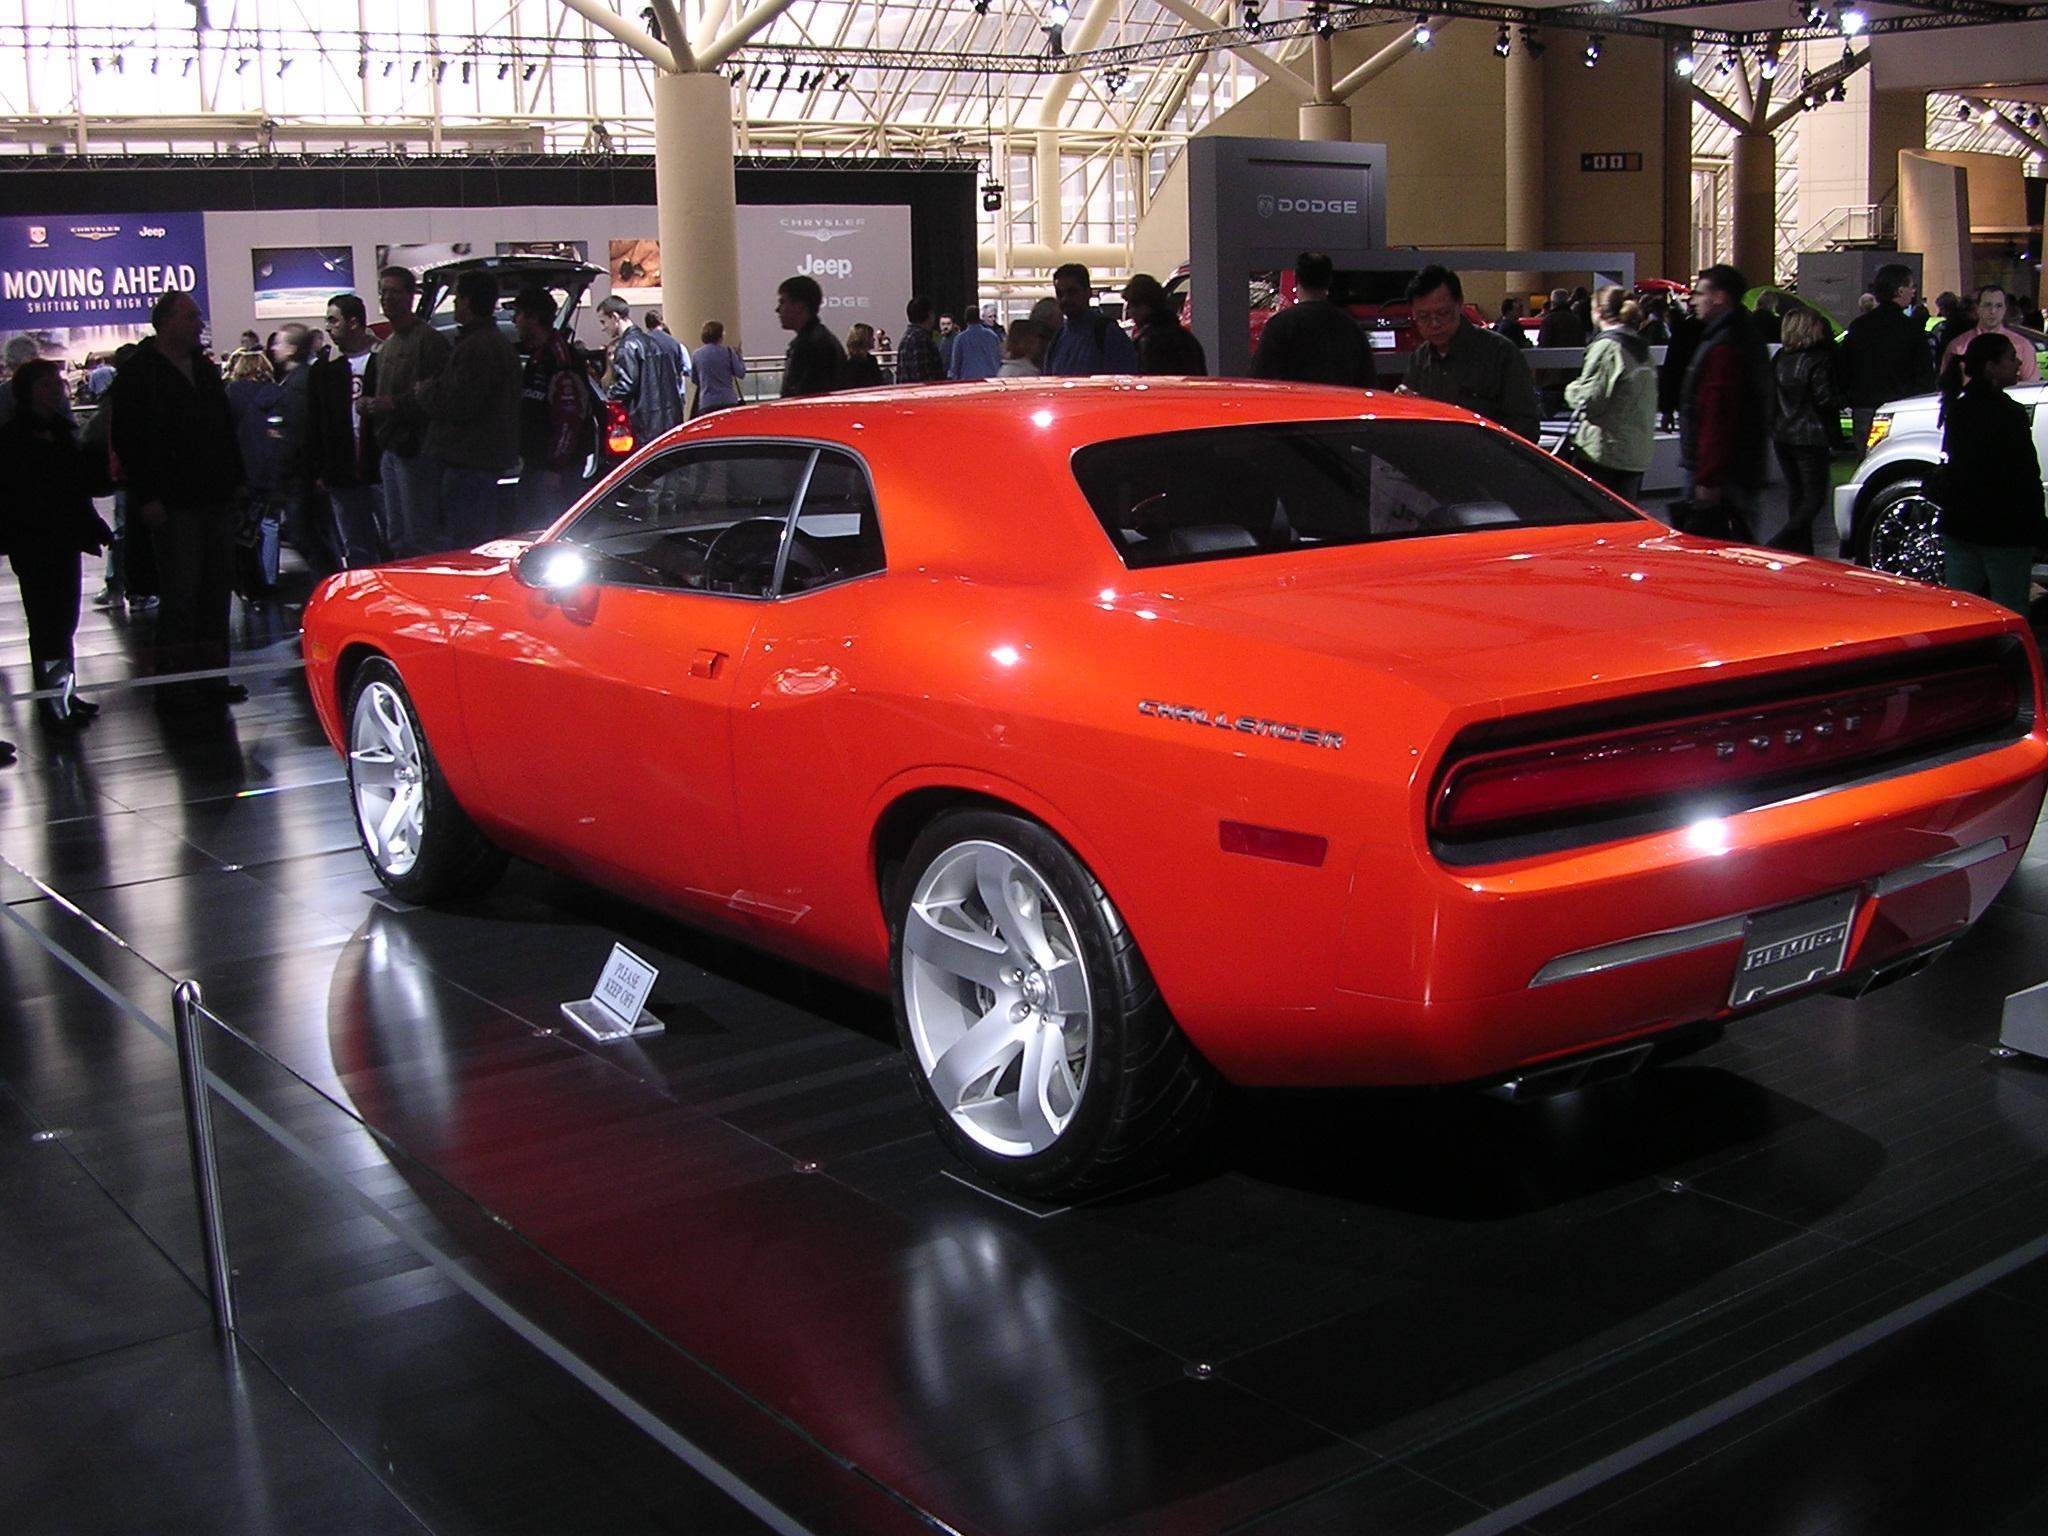 Dodge Charger Demon >> File:Dodge Challenger Concept - rear - CIAS2007.jpg ...